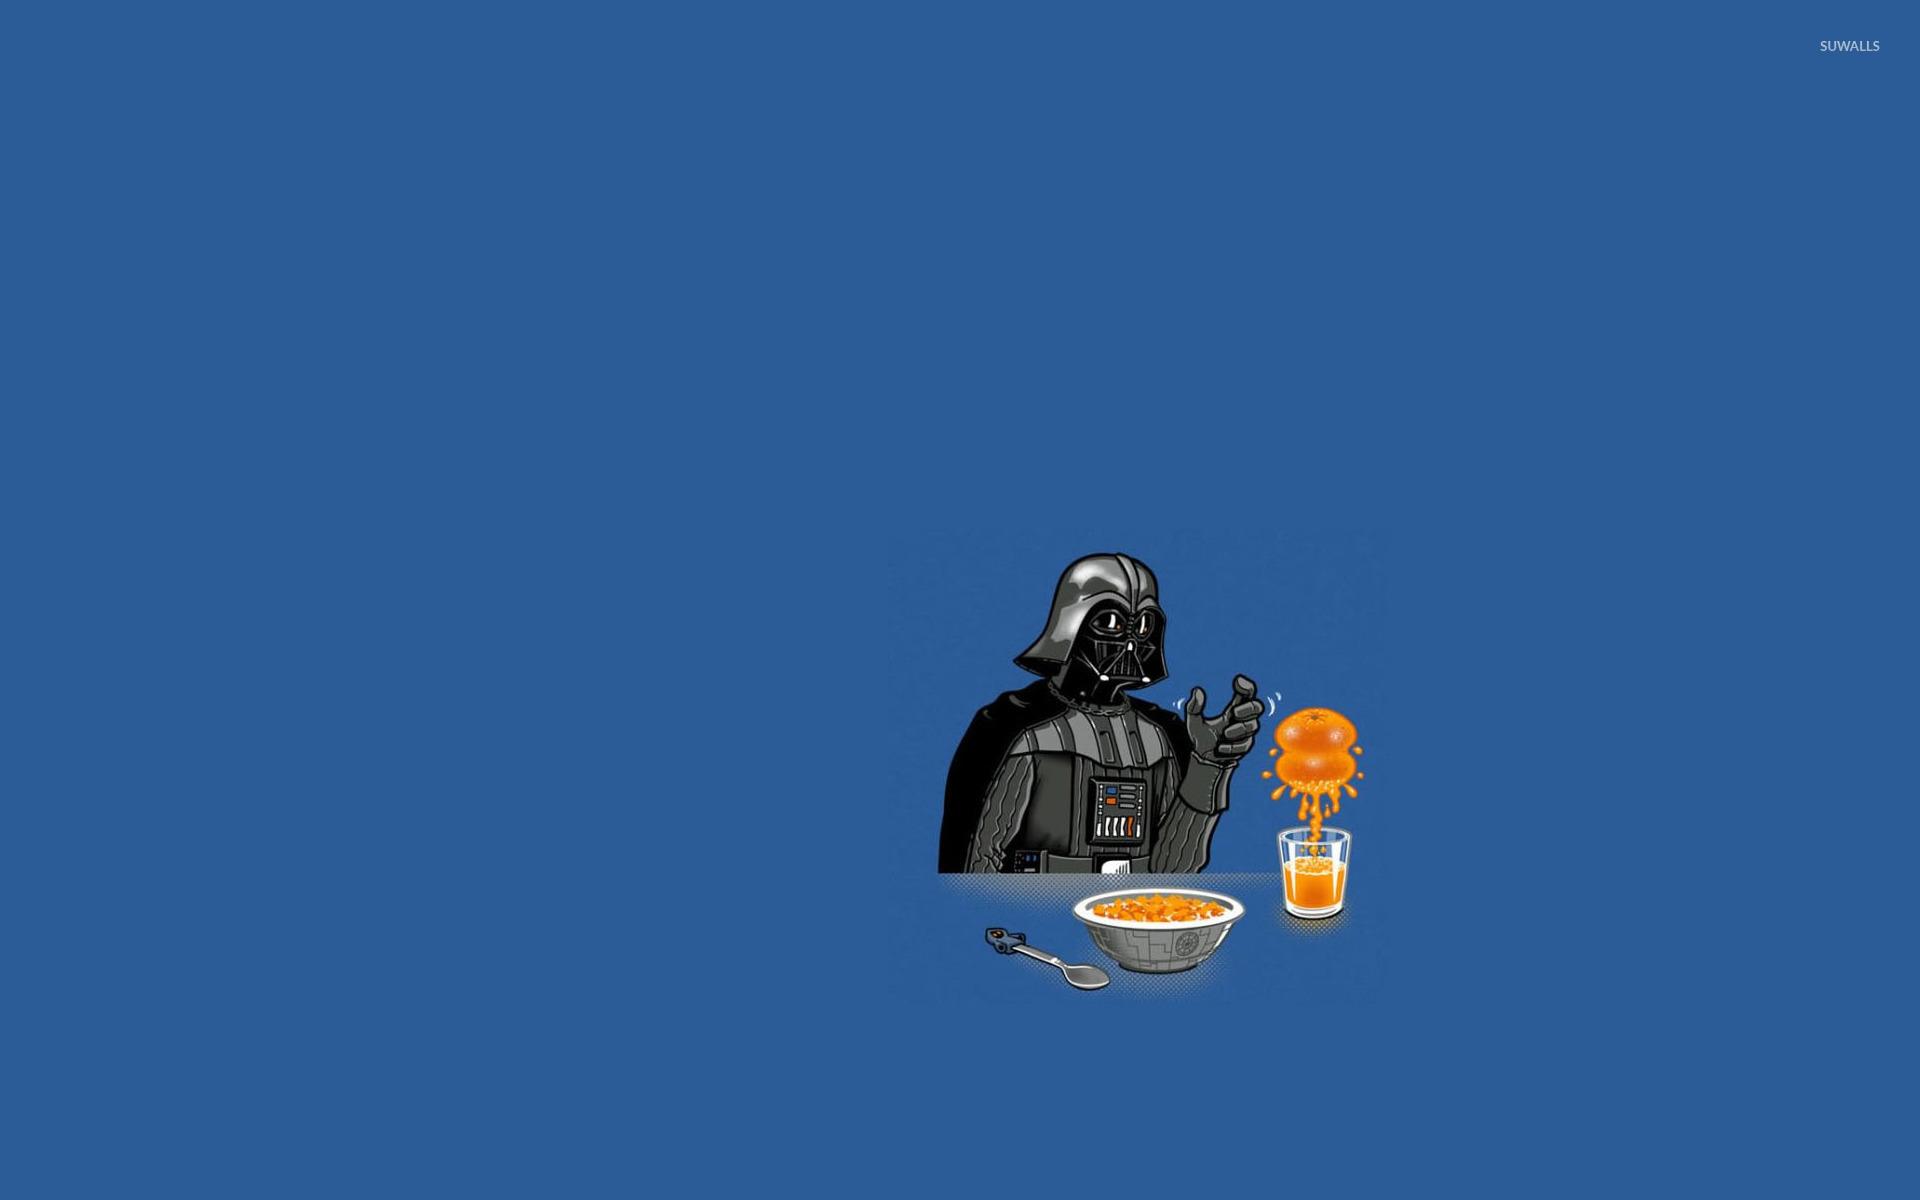 vader funny minimalistic - photo #10